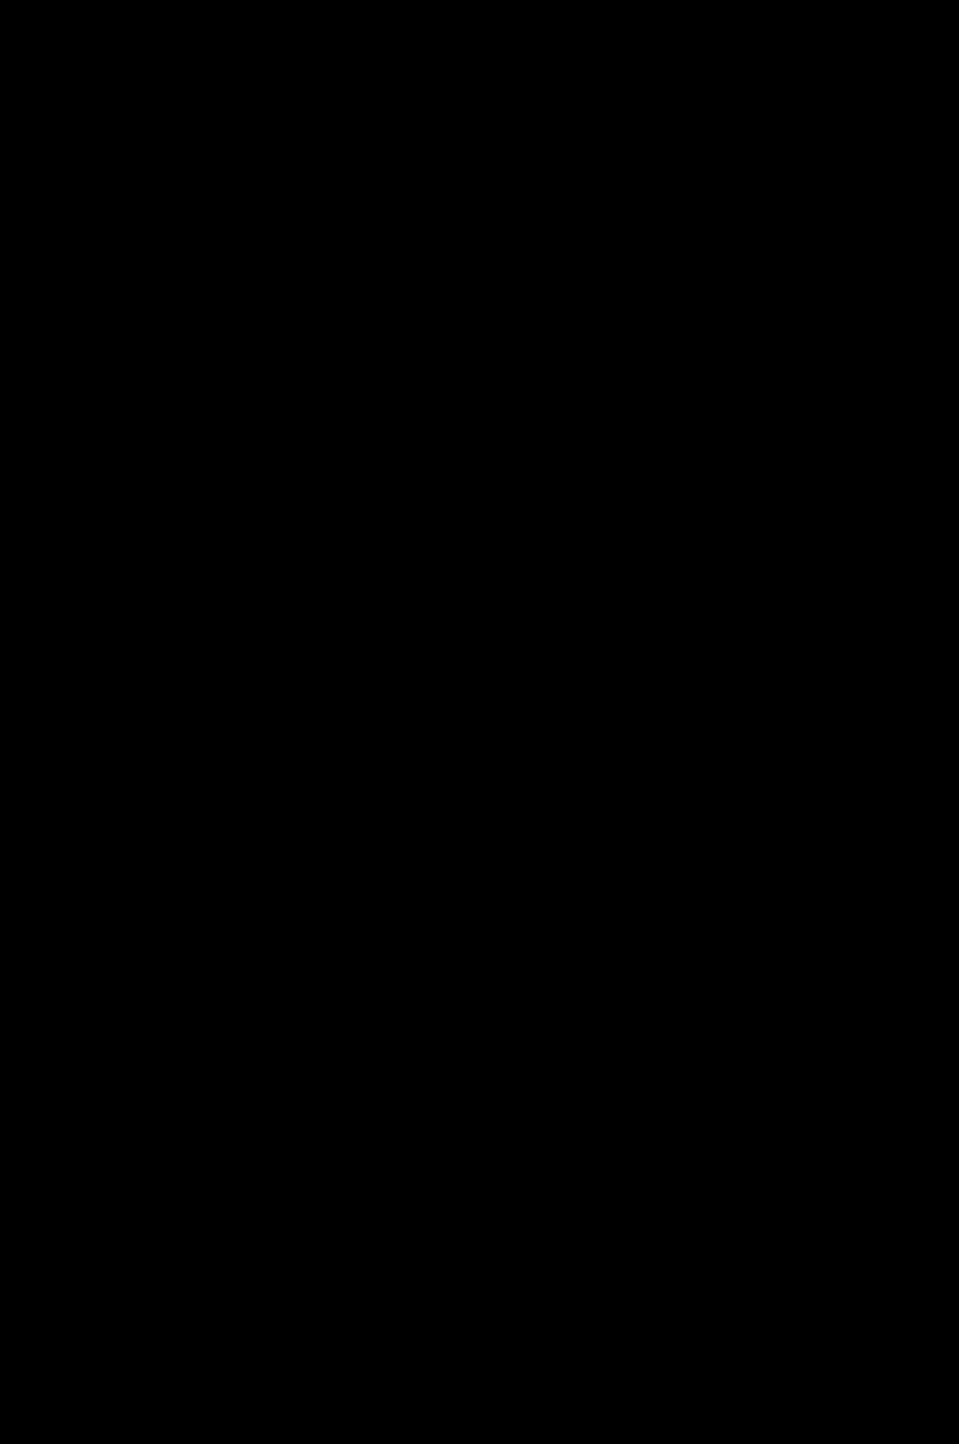 6 Lightning Bolt Drawing Png Transparent Onlygfx Com